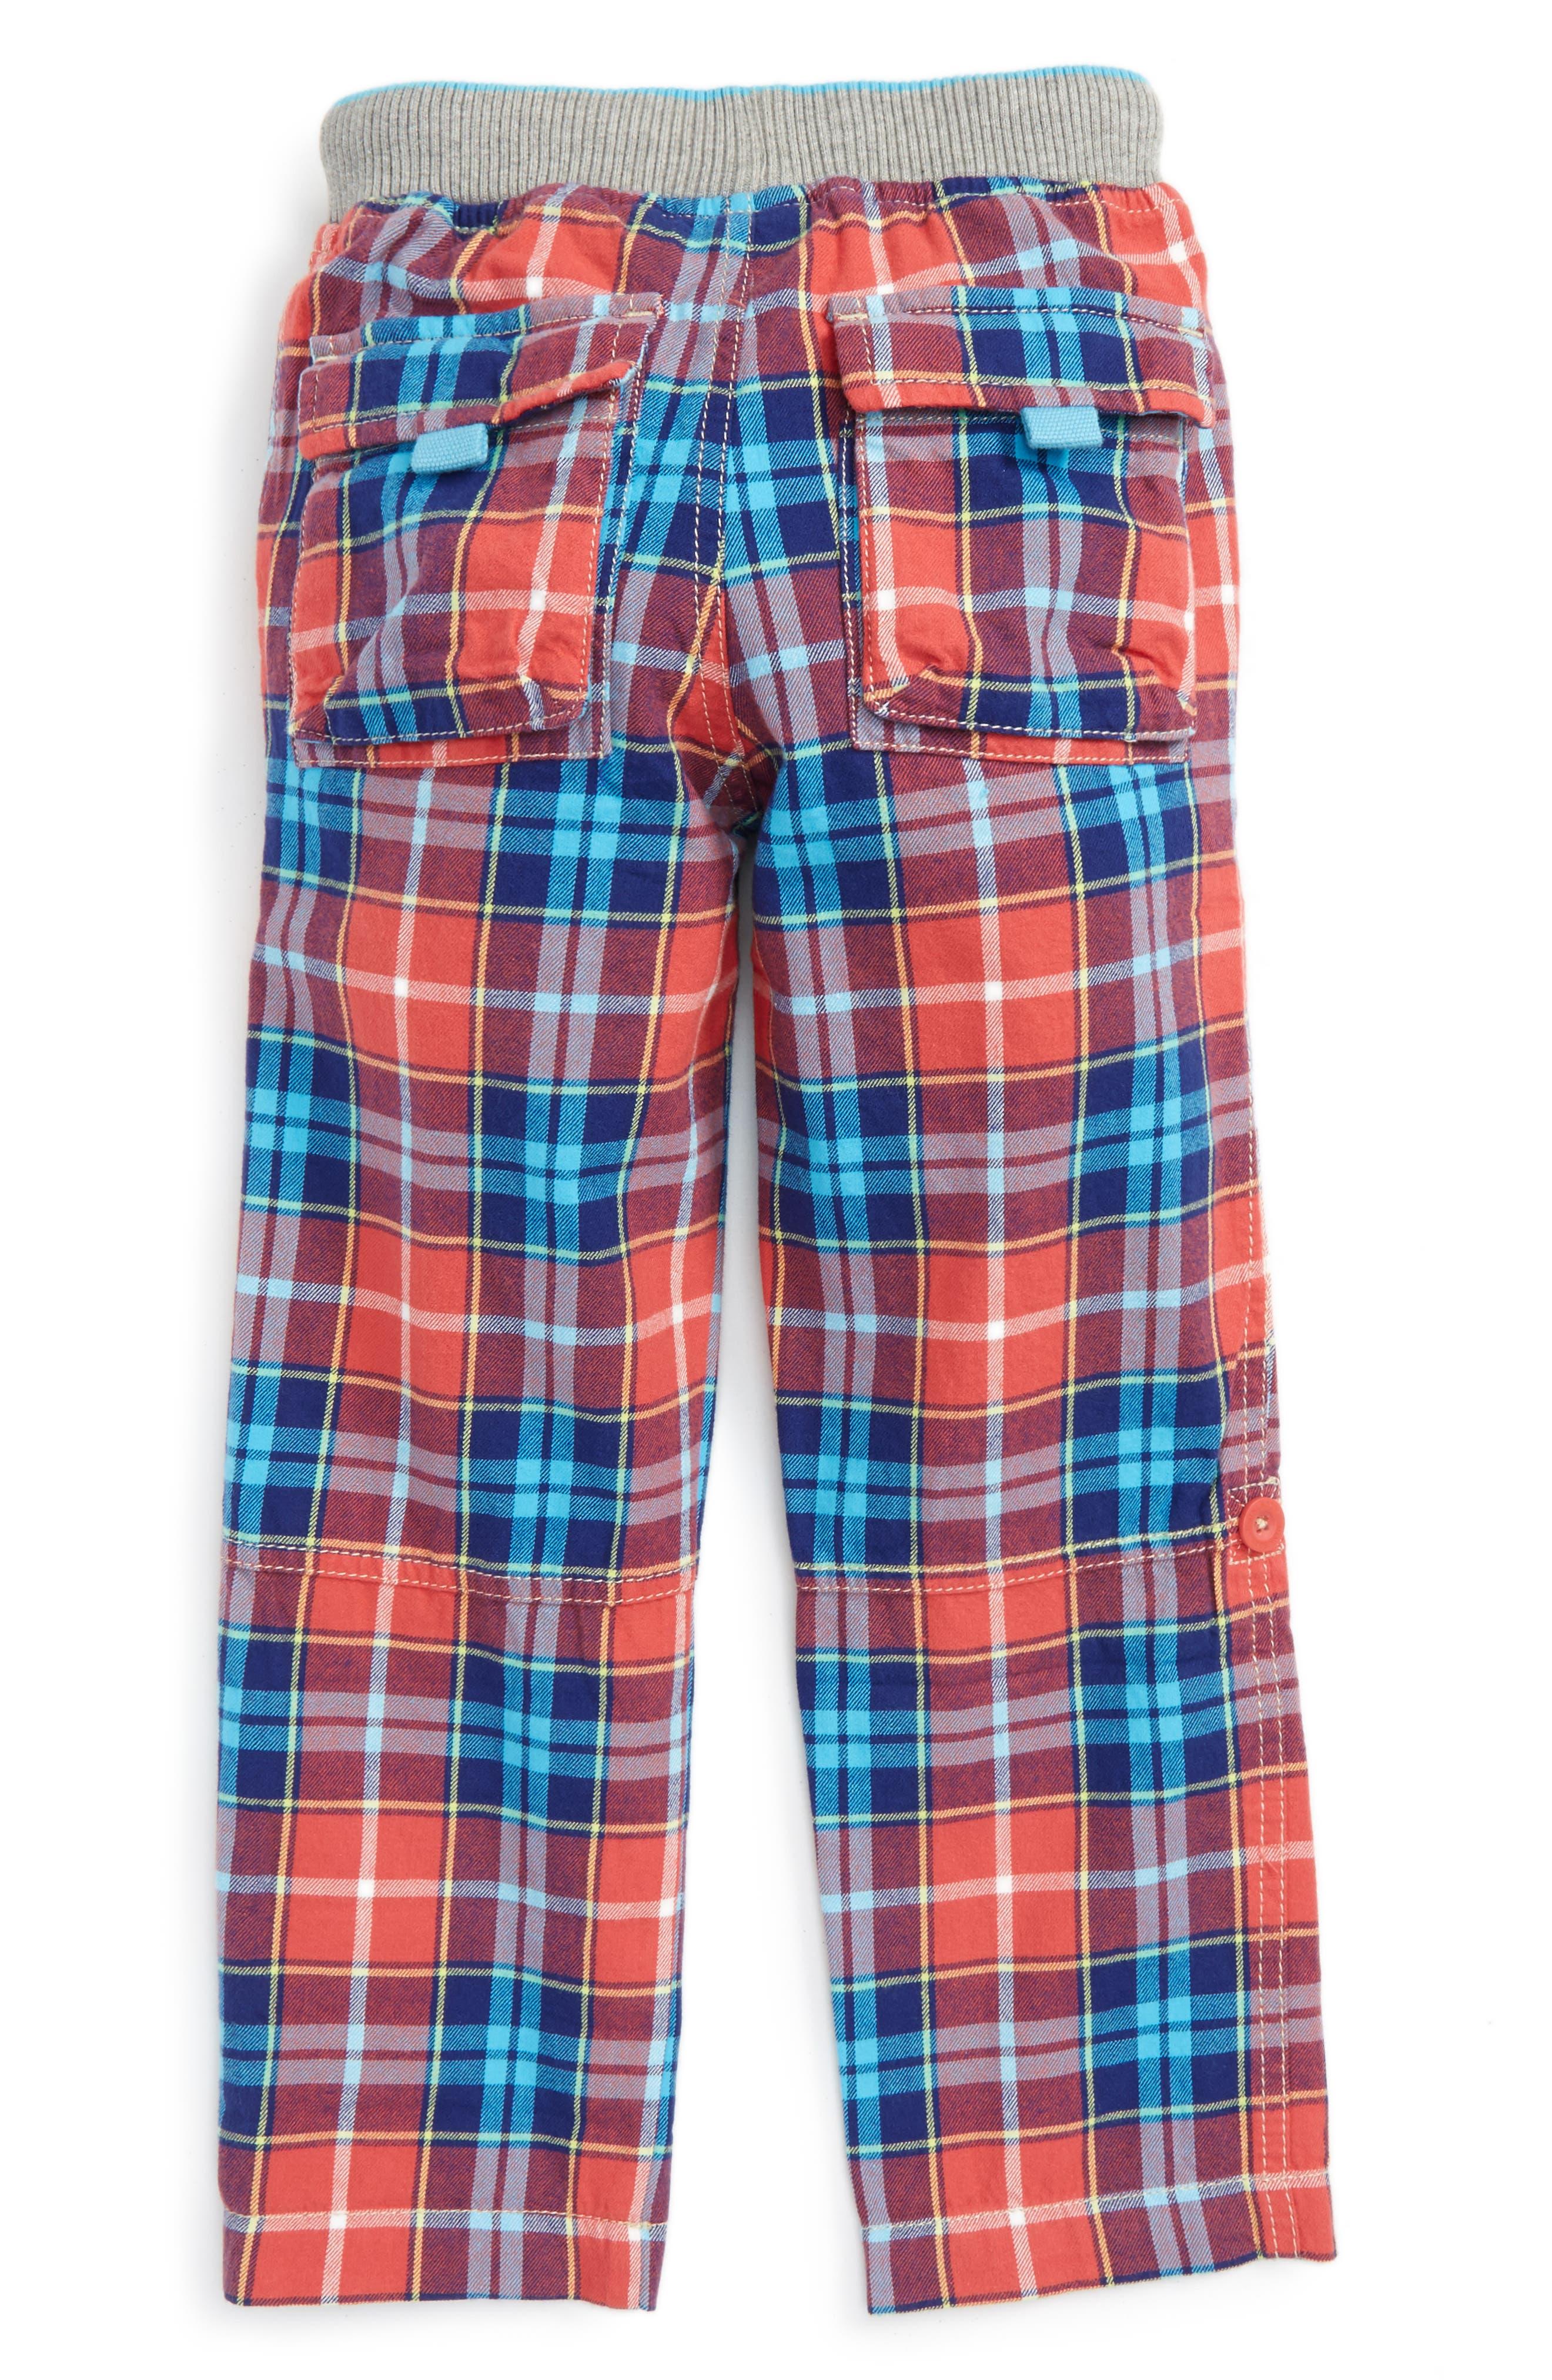 Alternate Image 2  - Mini Boden Surf Roll-Up Pants (Toddler Boys, Little Boys & Big Boys)